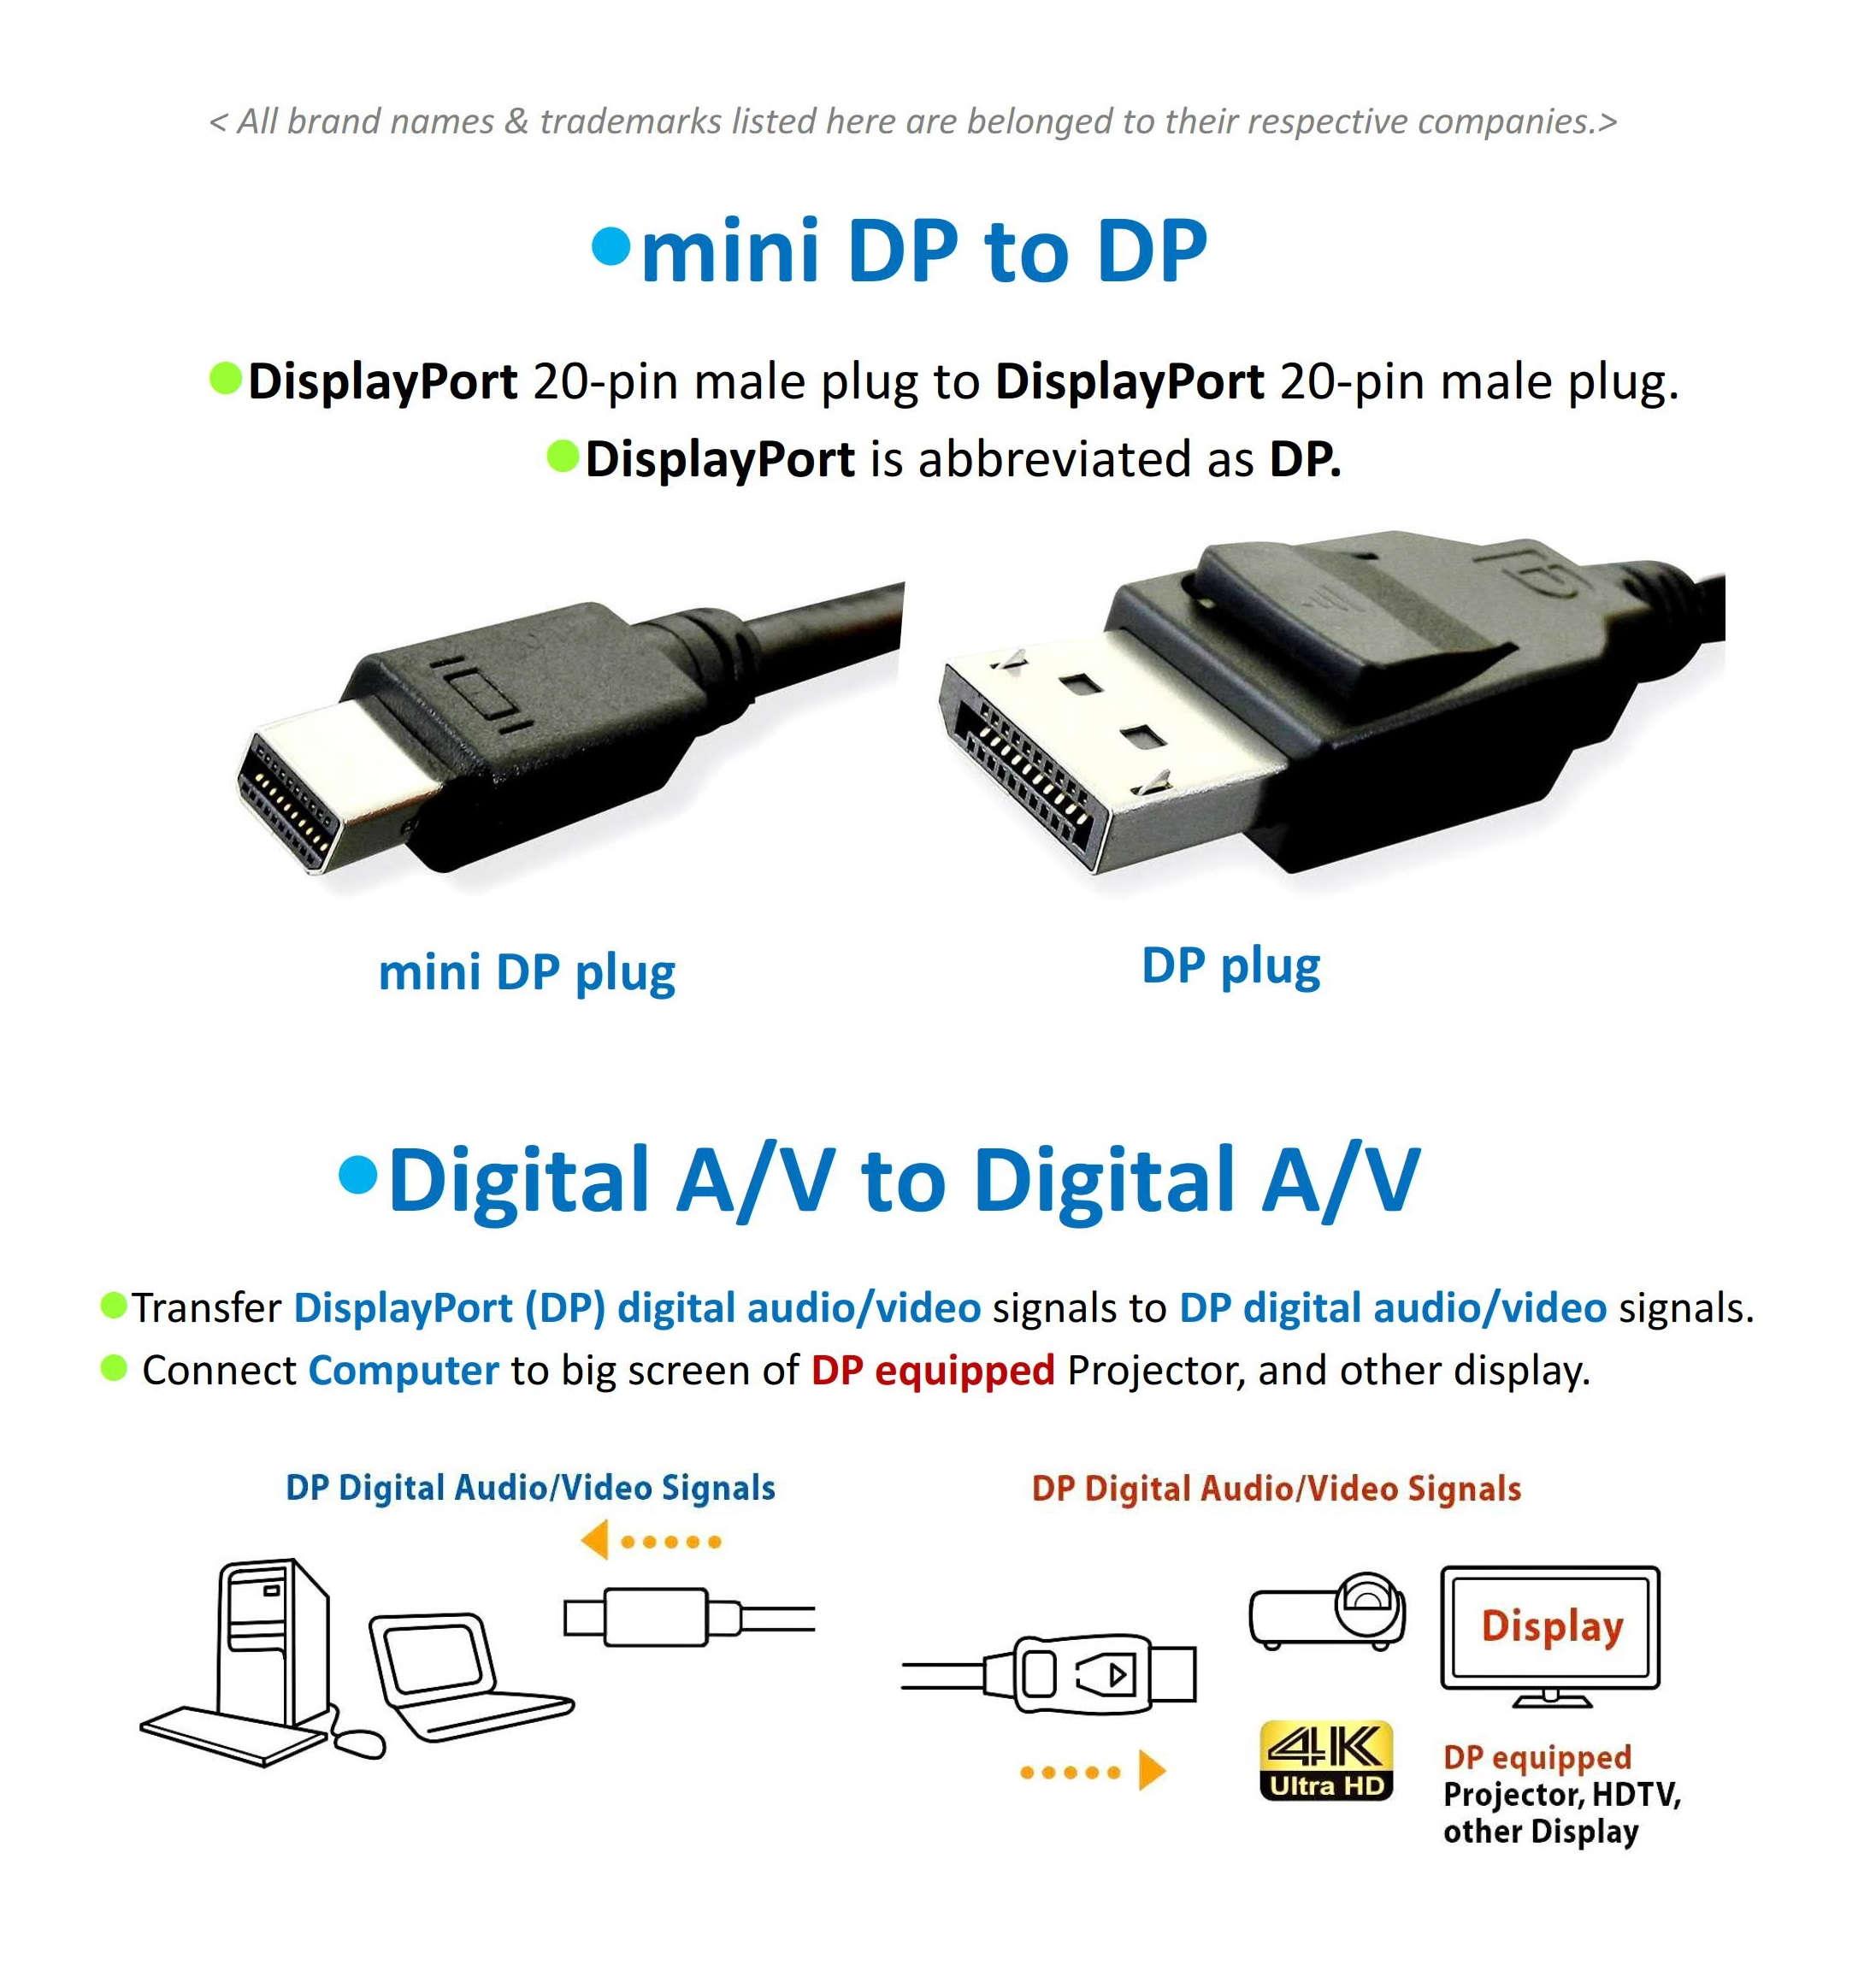 Paugge V1 2 Vesa DisplayPort Sertifikalı 21 60 Gbps Bandwith 5K 30Hz, 4K  60Hz, 2K 165Hz, 1080p 240Hz Destekli FreeSync G-Sync Thunderbolt 2 Mini